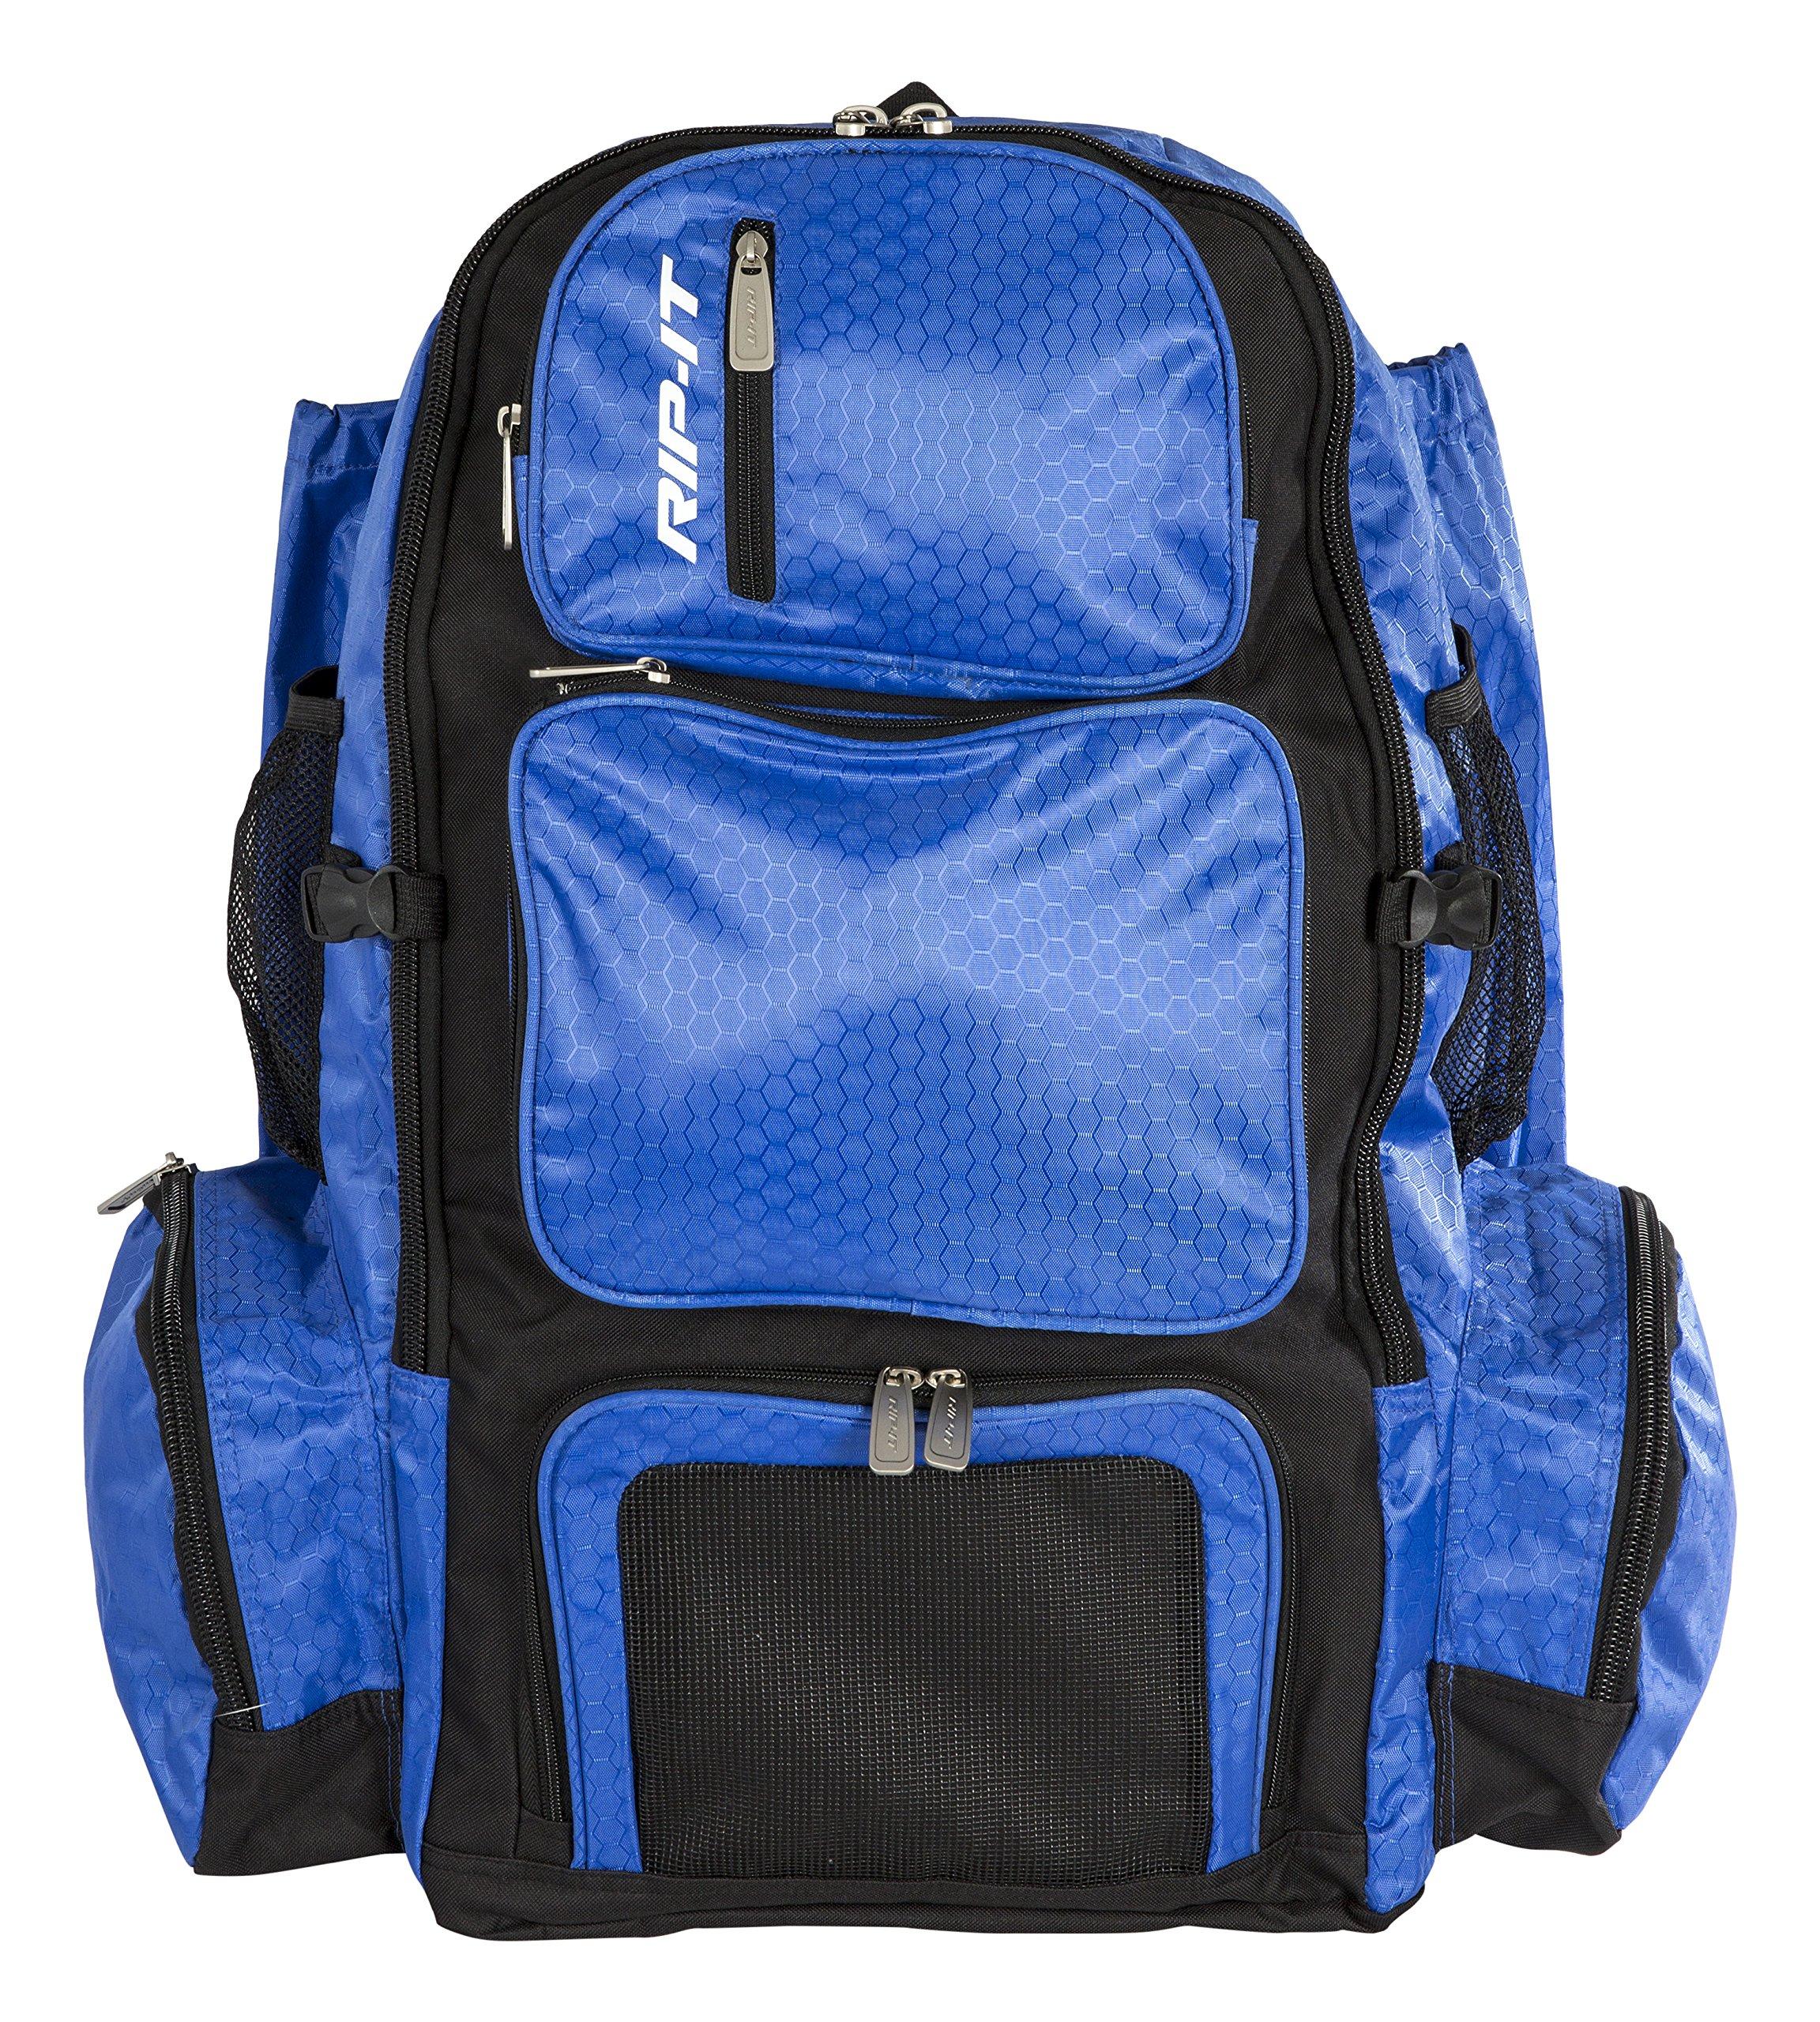 RIP-IT Pack It Up Backpack - Softball Equipment Bag - Royal